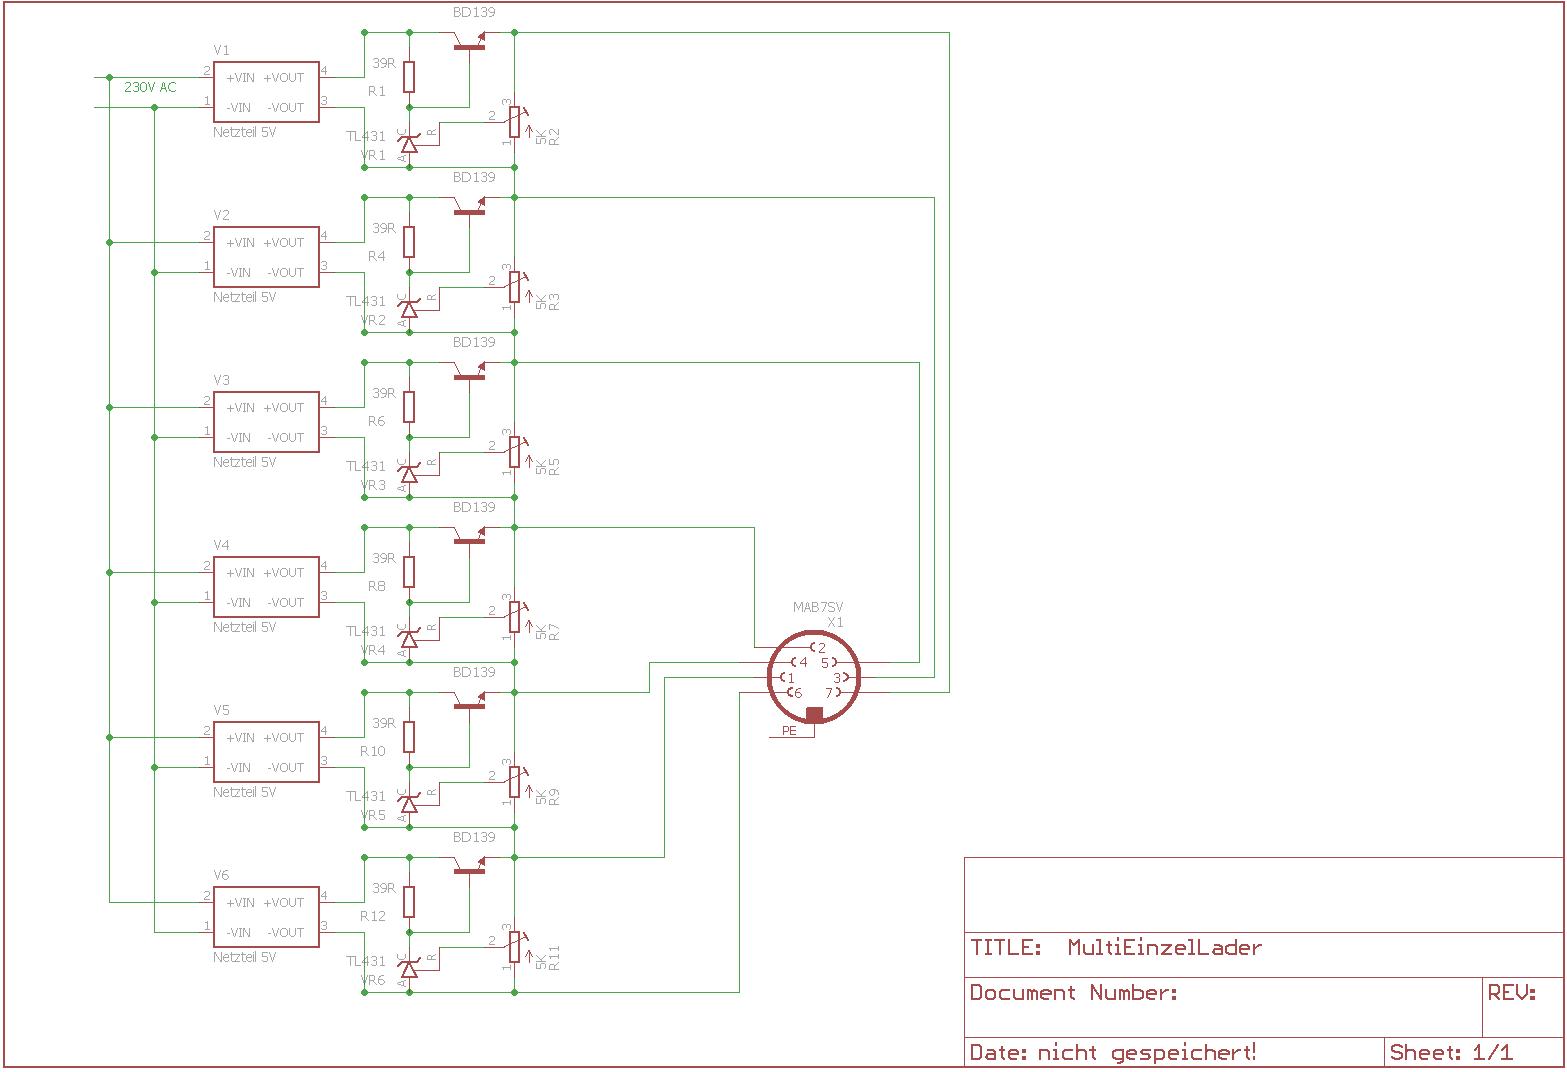 4 18650 Zellen in Reihe aufladen? - Mikrocontroller.net